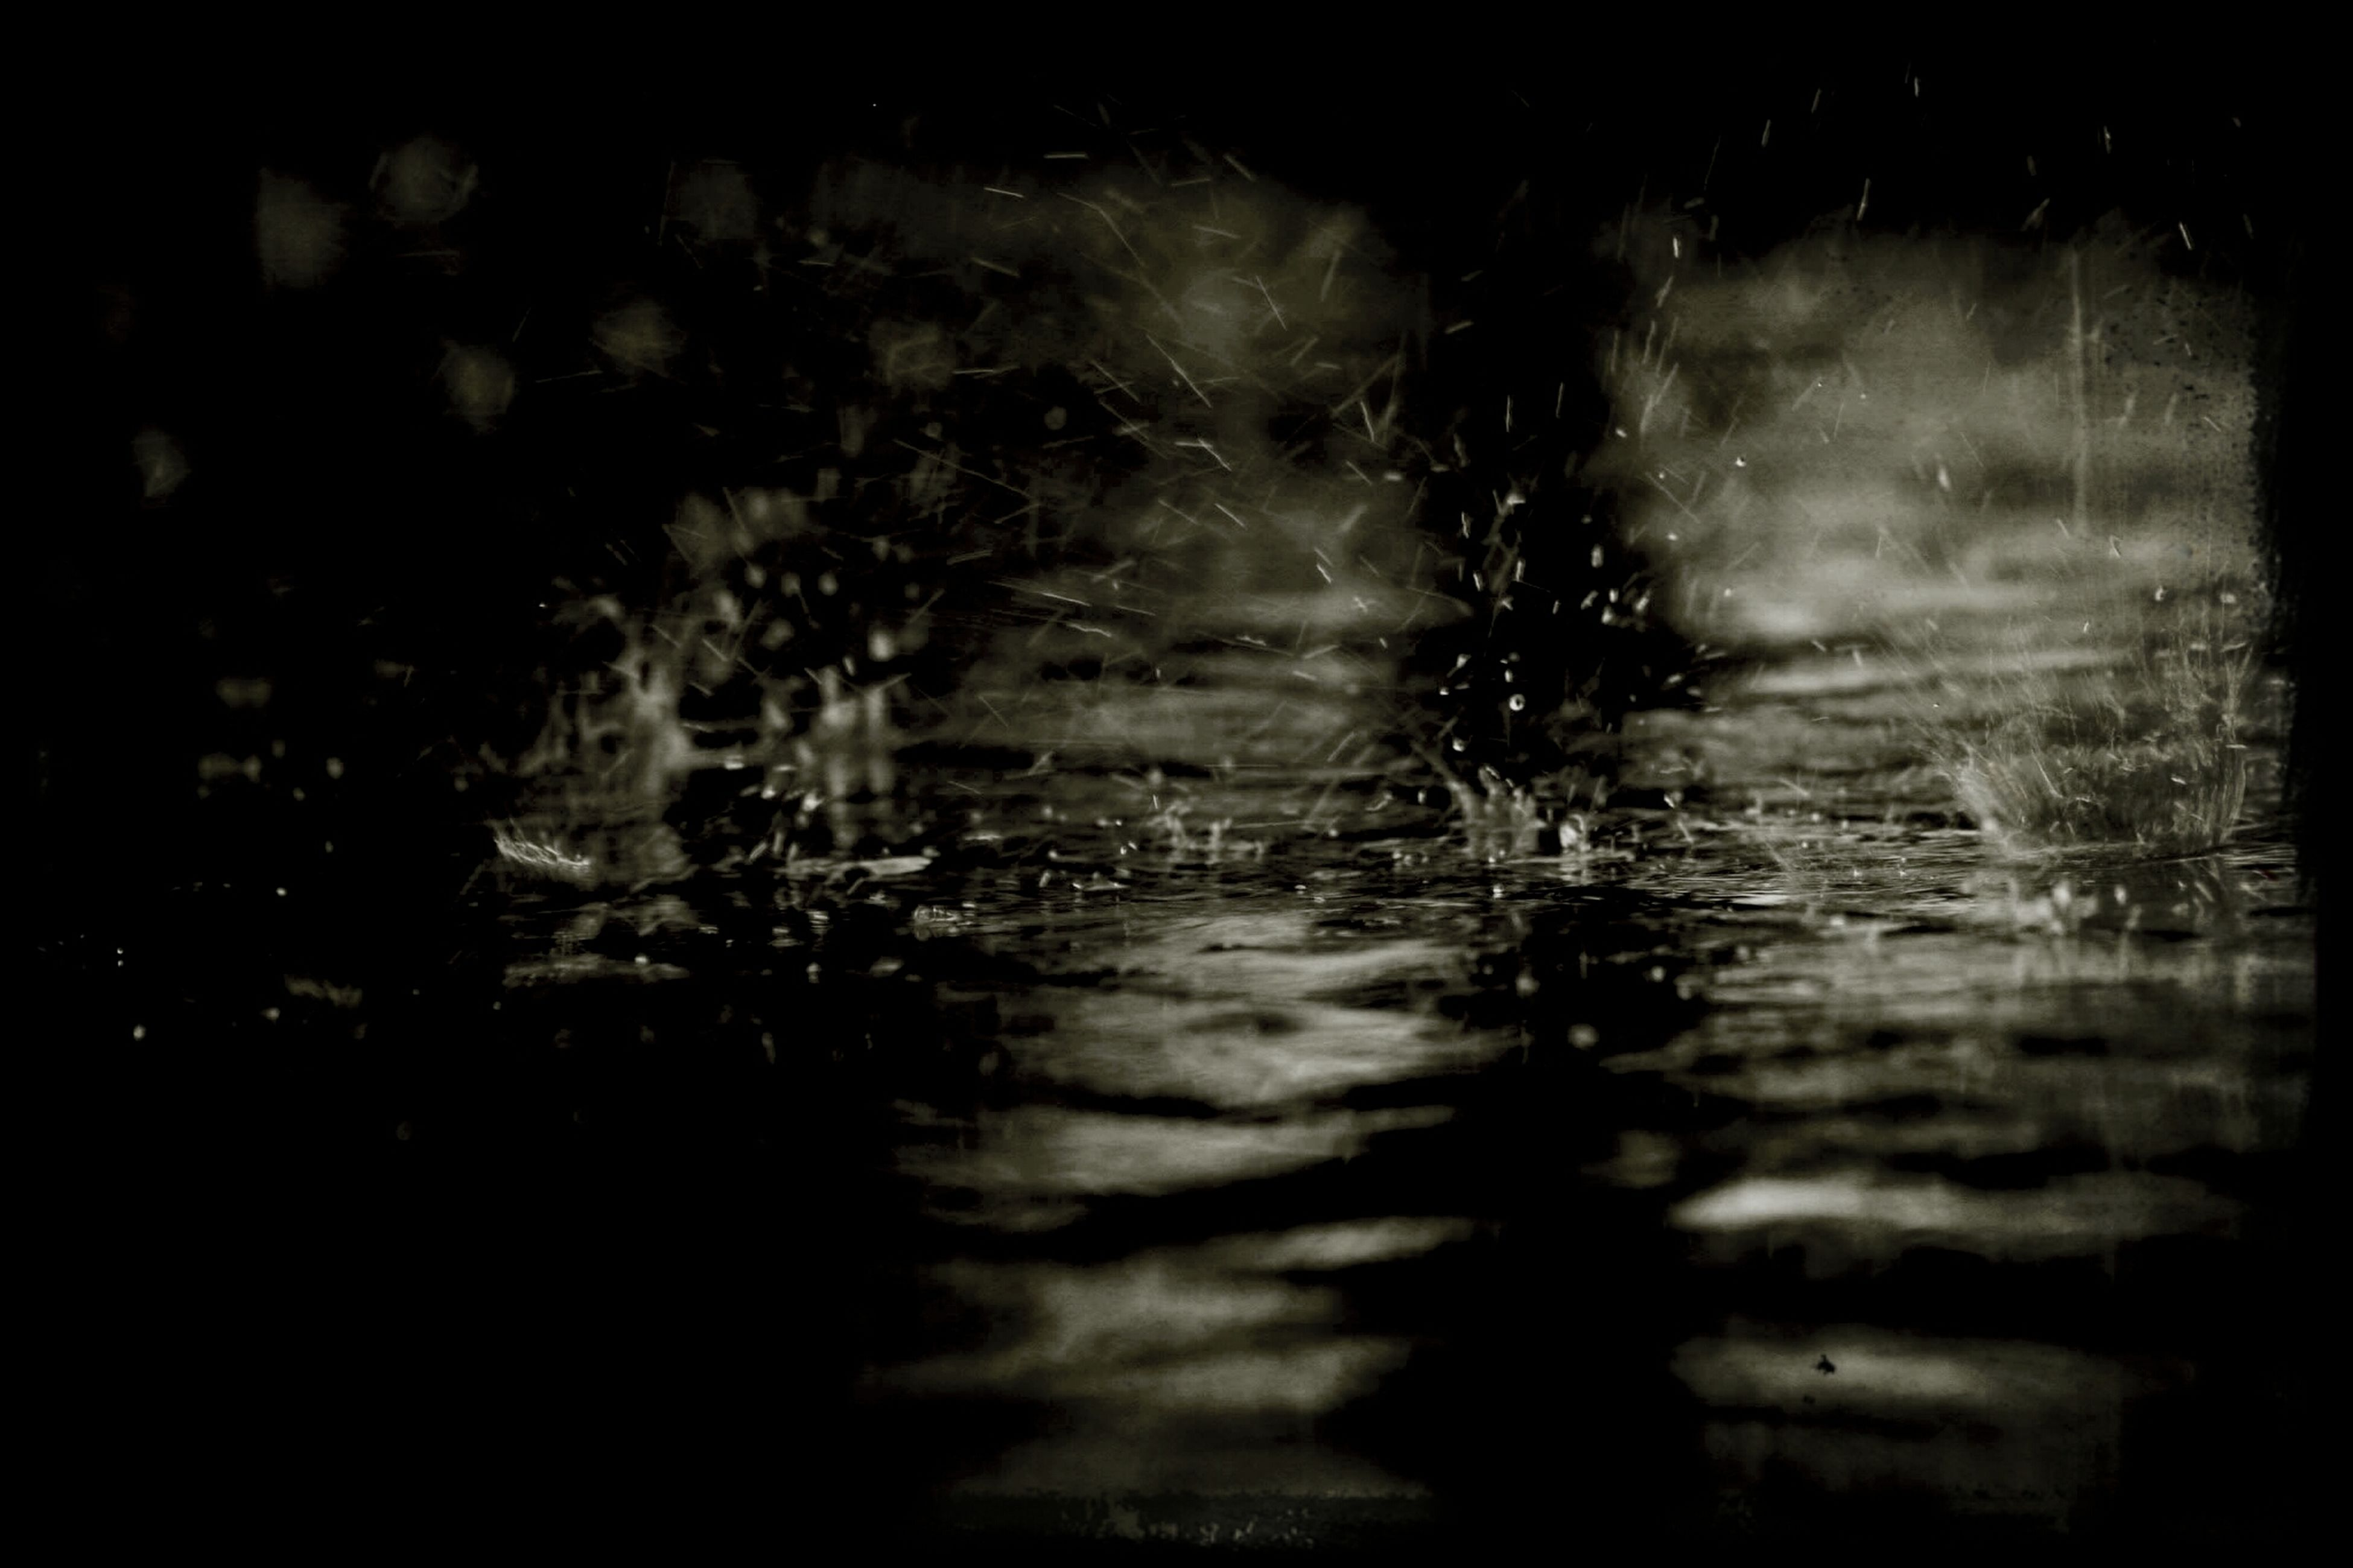 night, water, illuminated, rain, drop, wet, indoors, transparent, dark, window, reflection, weather, glass - material, light - natural phenomenon, nature, no people, raindrop, sky, season